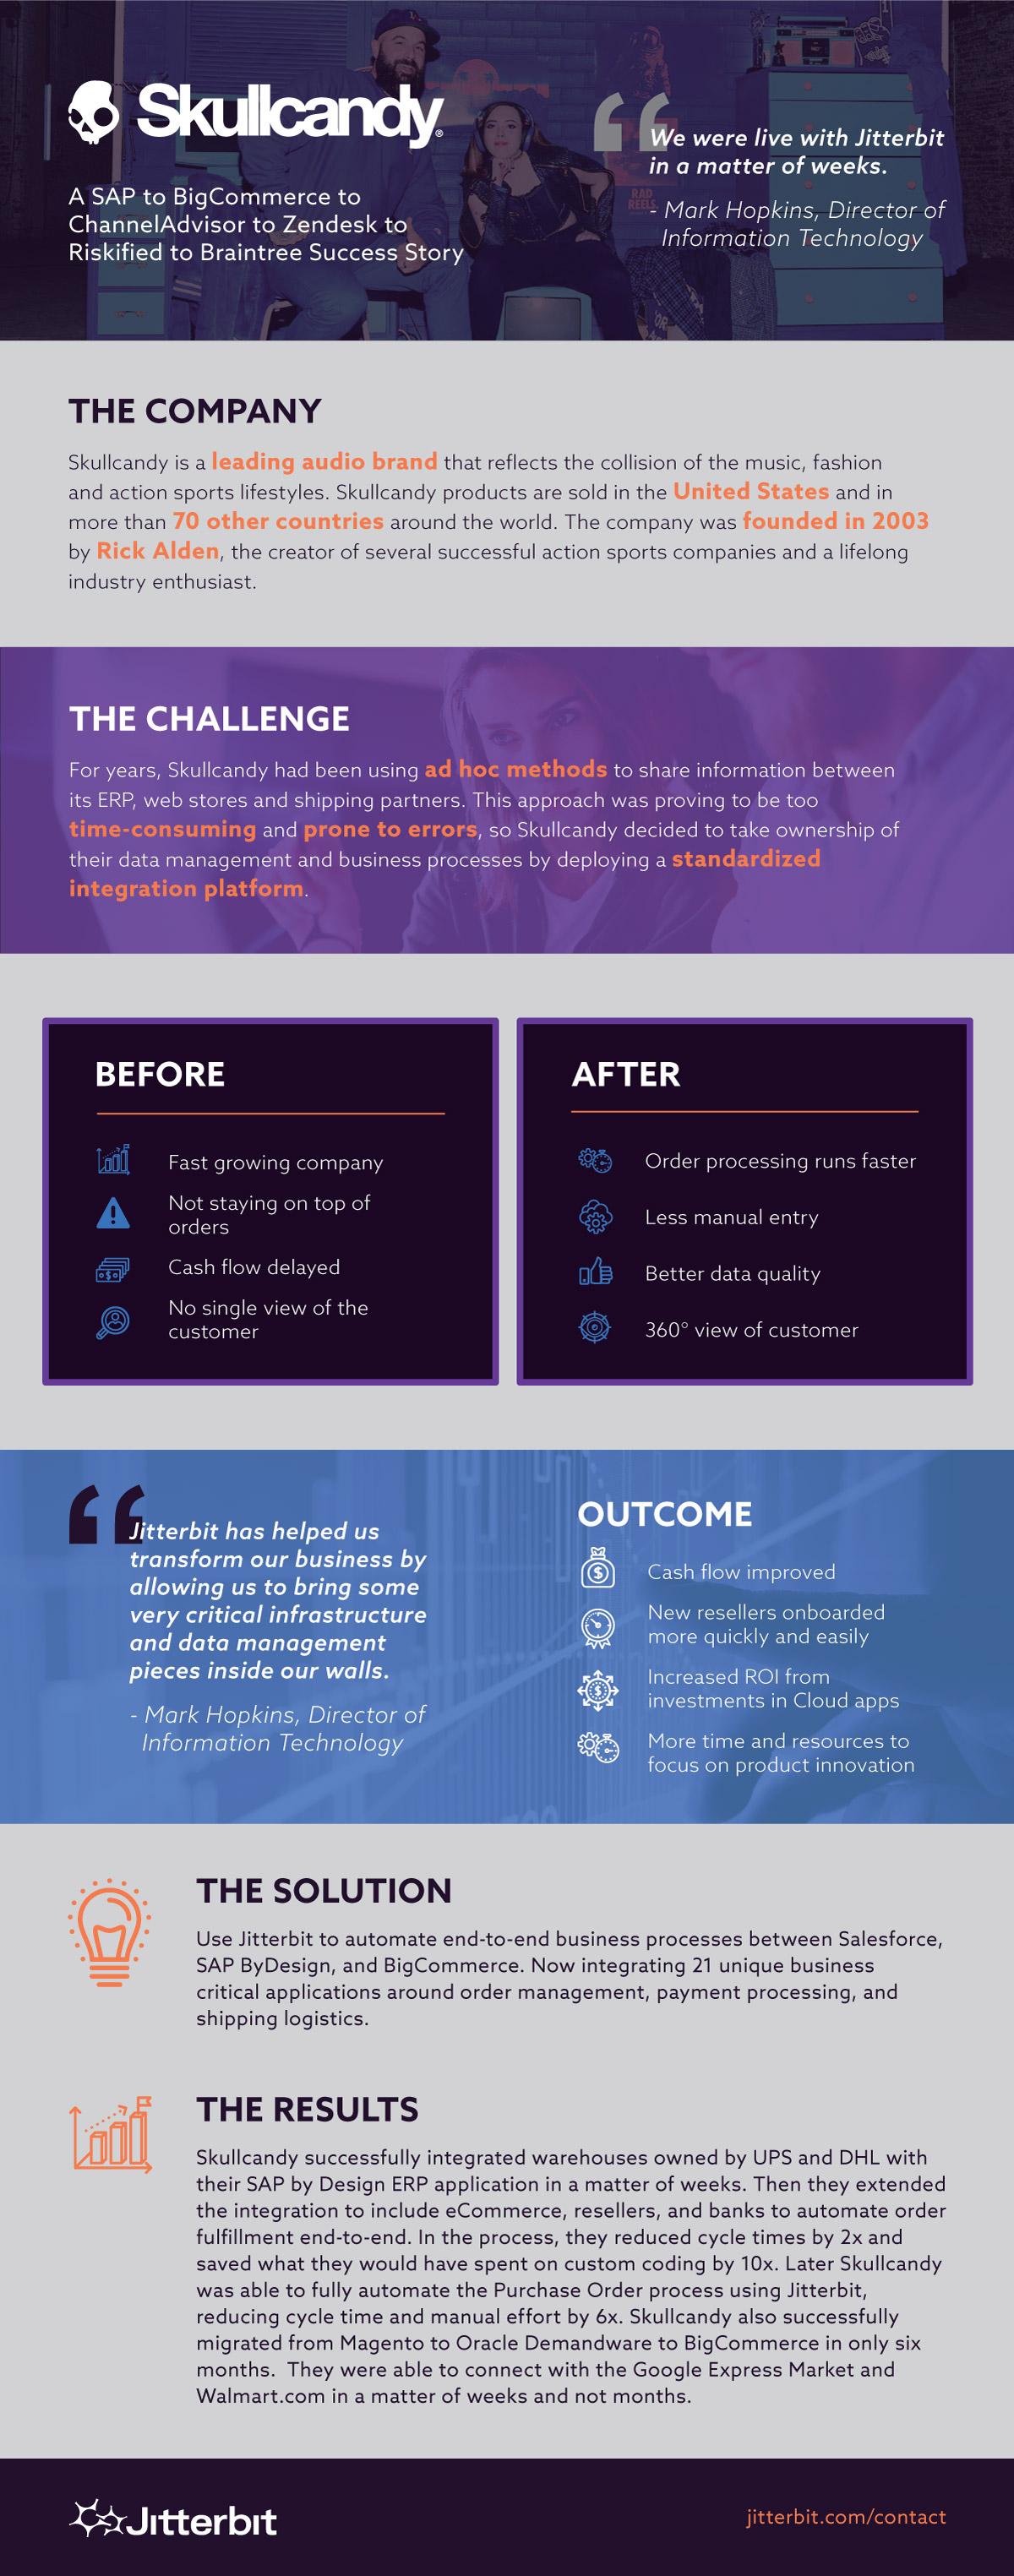 Skullcandy Jitterbit Integration Case Study Infographic